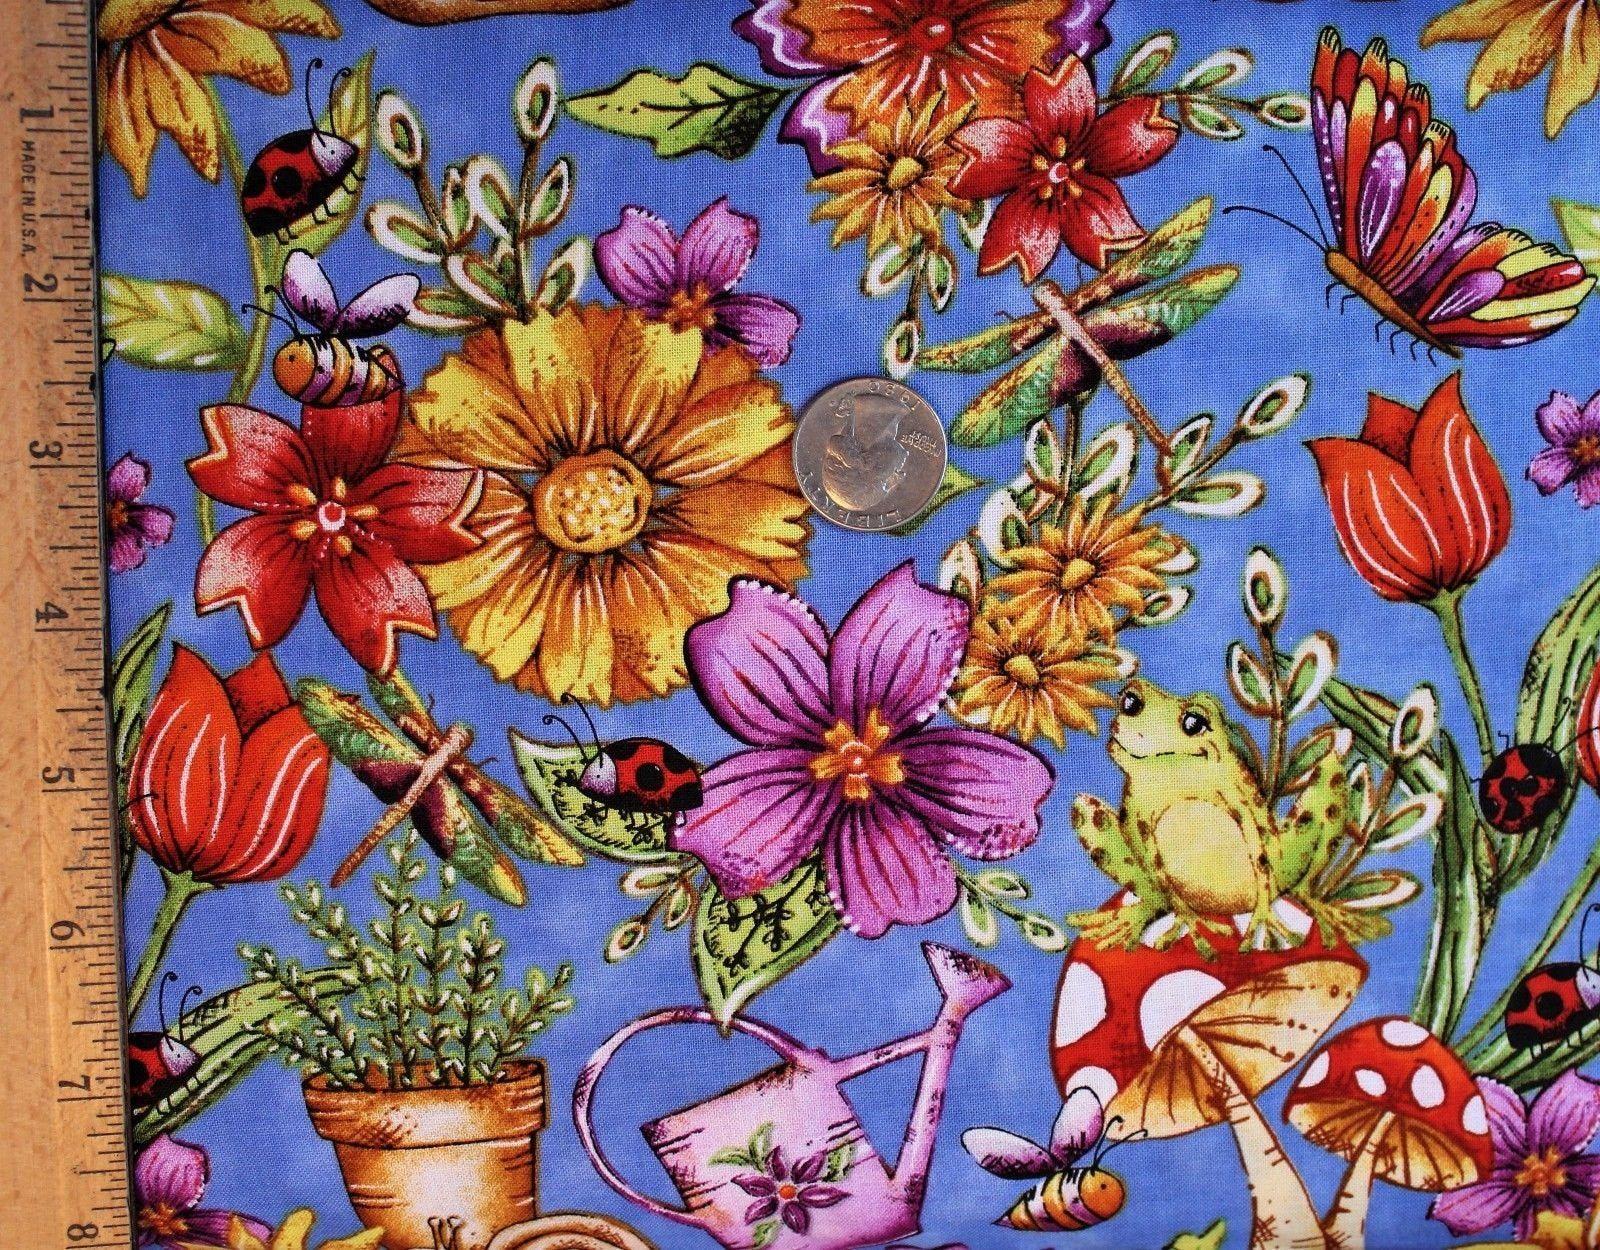 Garden glory by blank fabrics 100 cotton quilting fabric